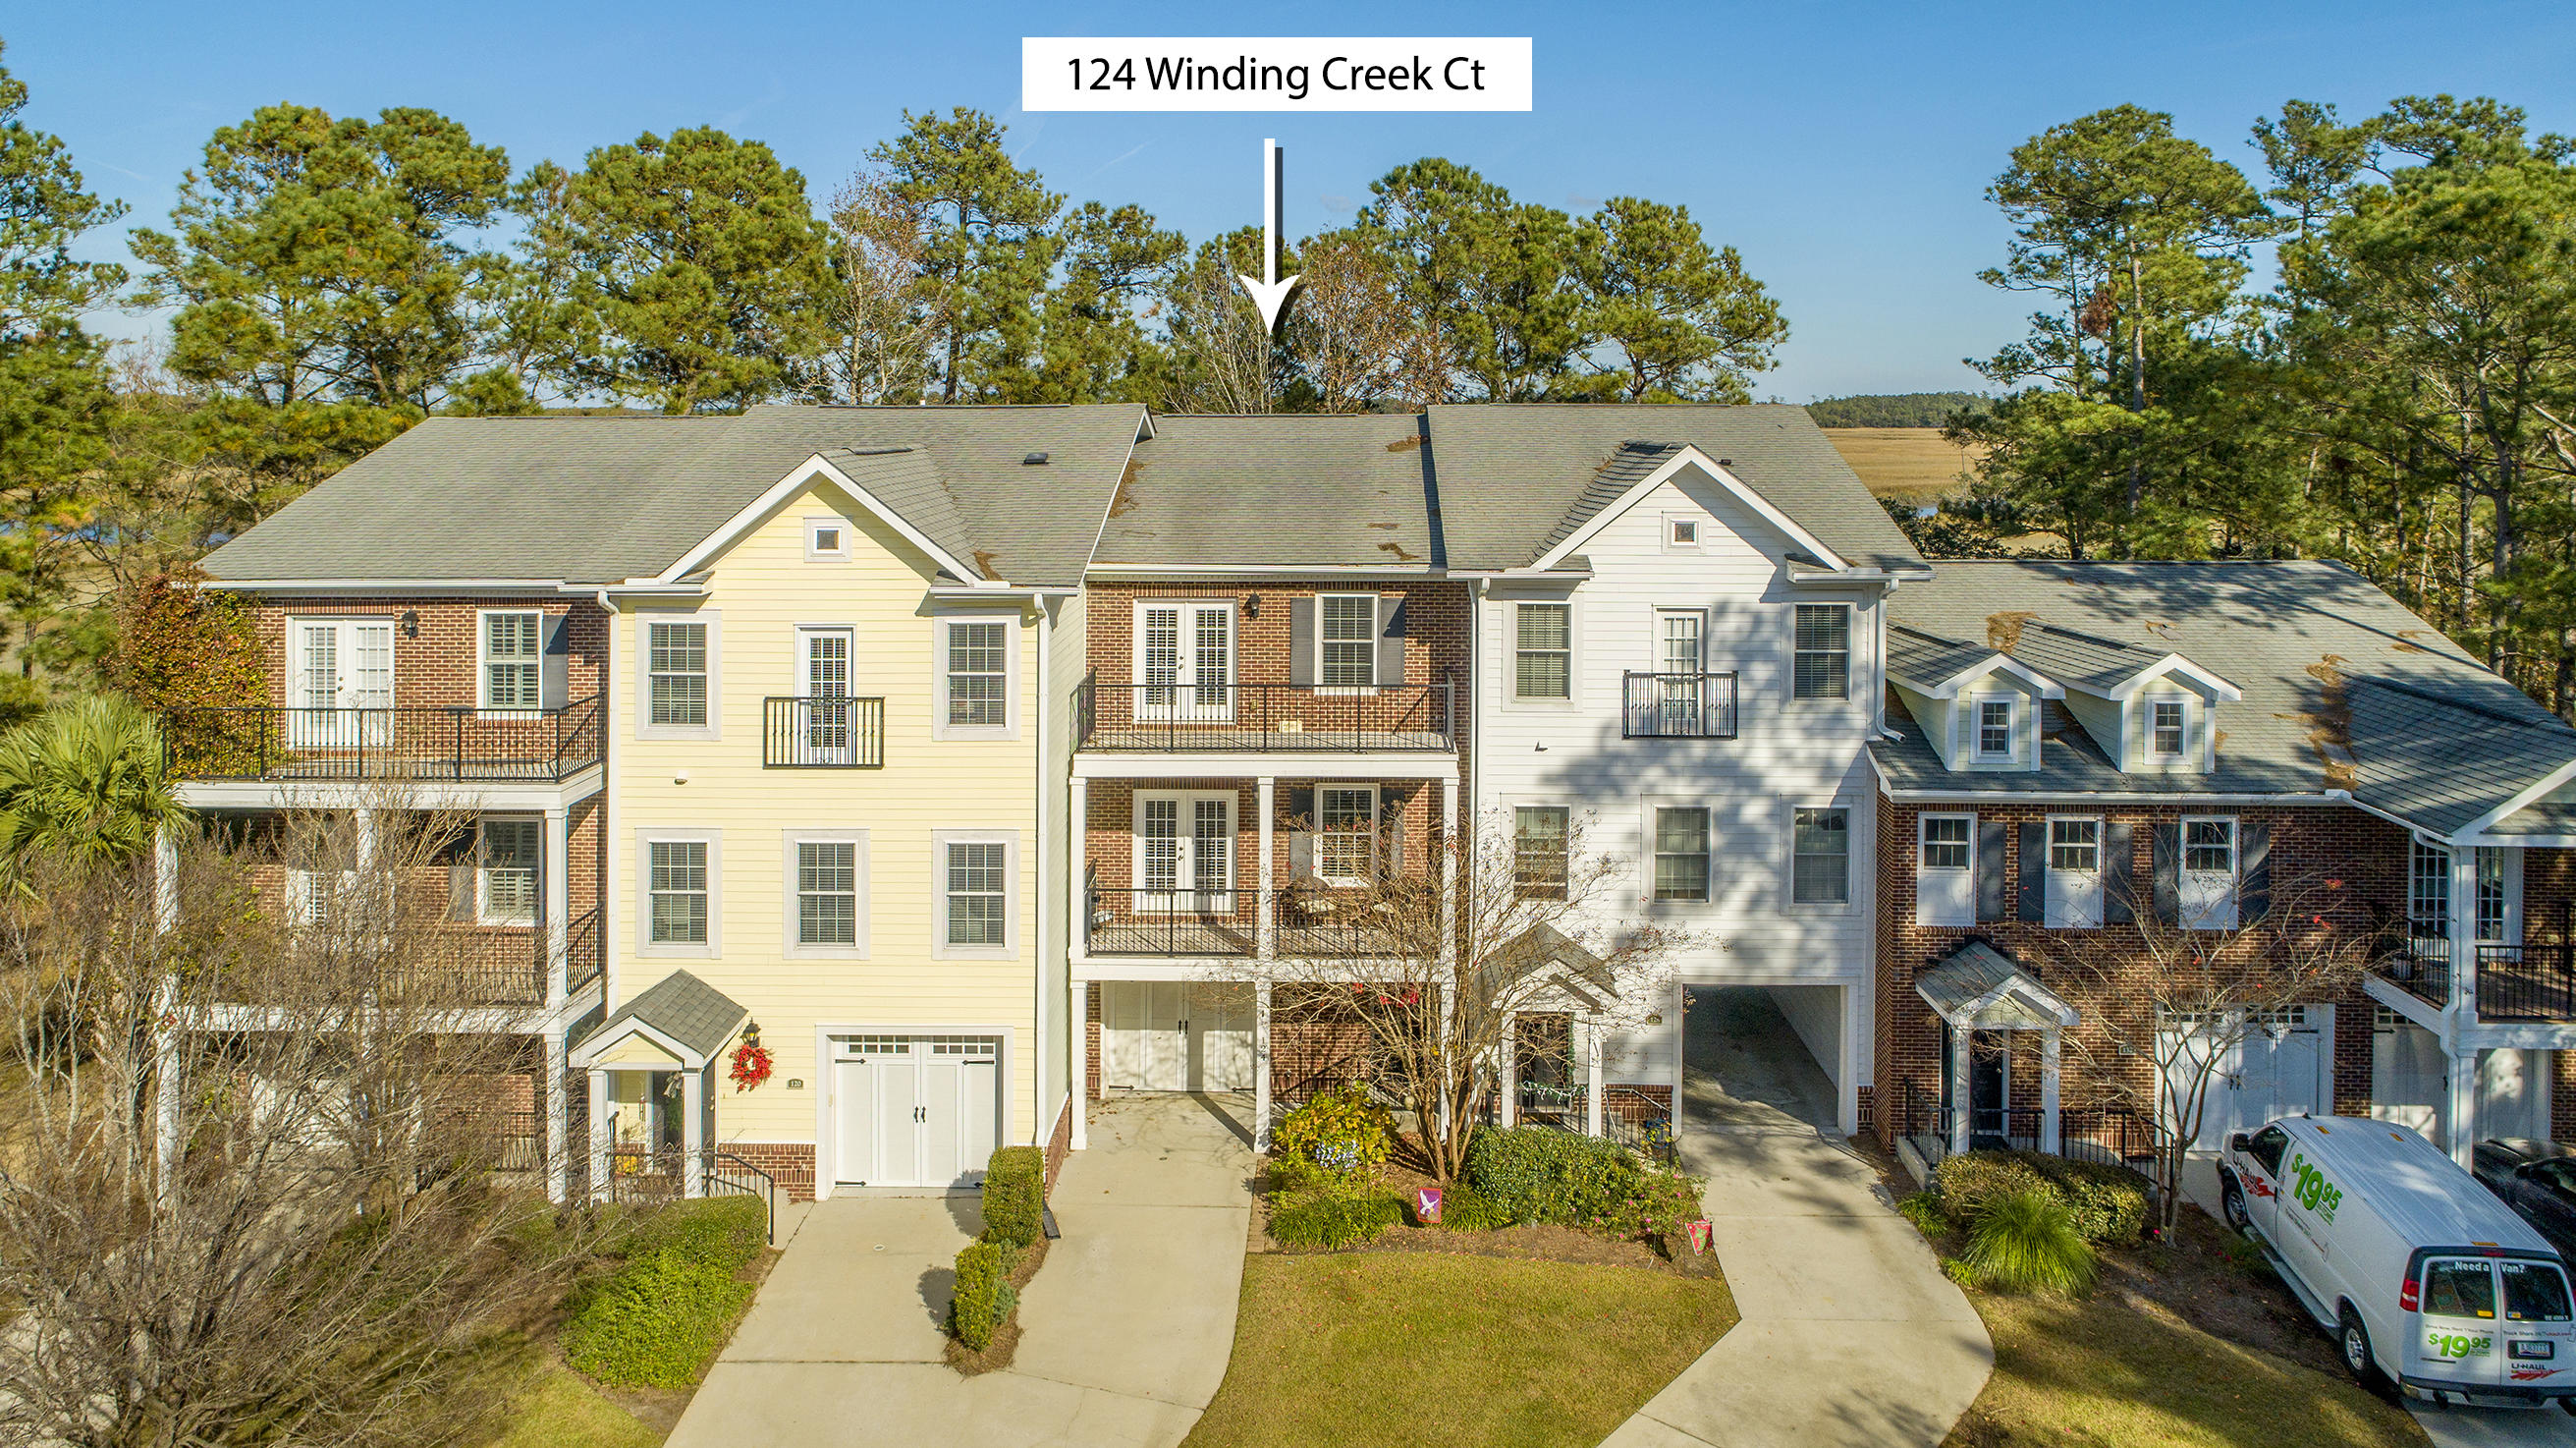 Etiwan Pointe Homes For Sale - 124 Winding Creek, Mount Pleasant, SC - 1